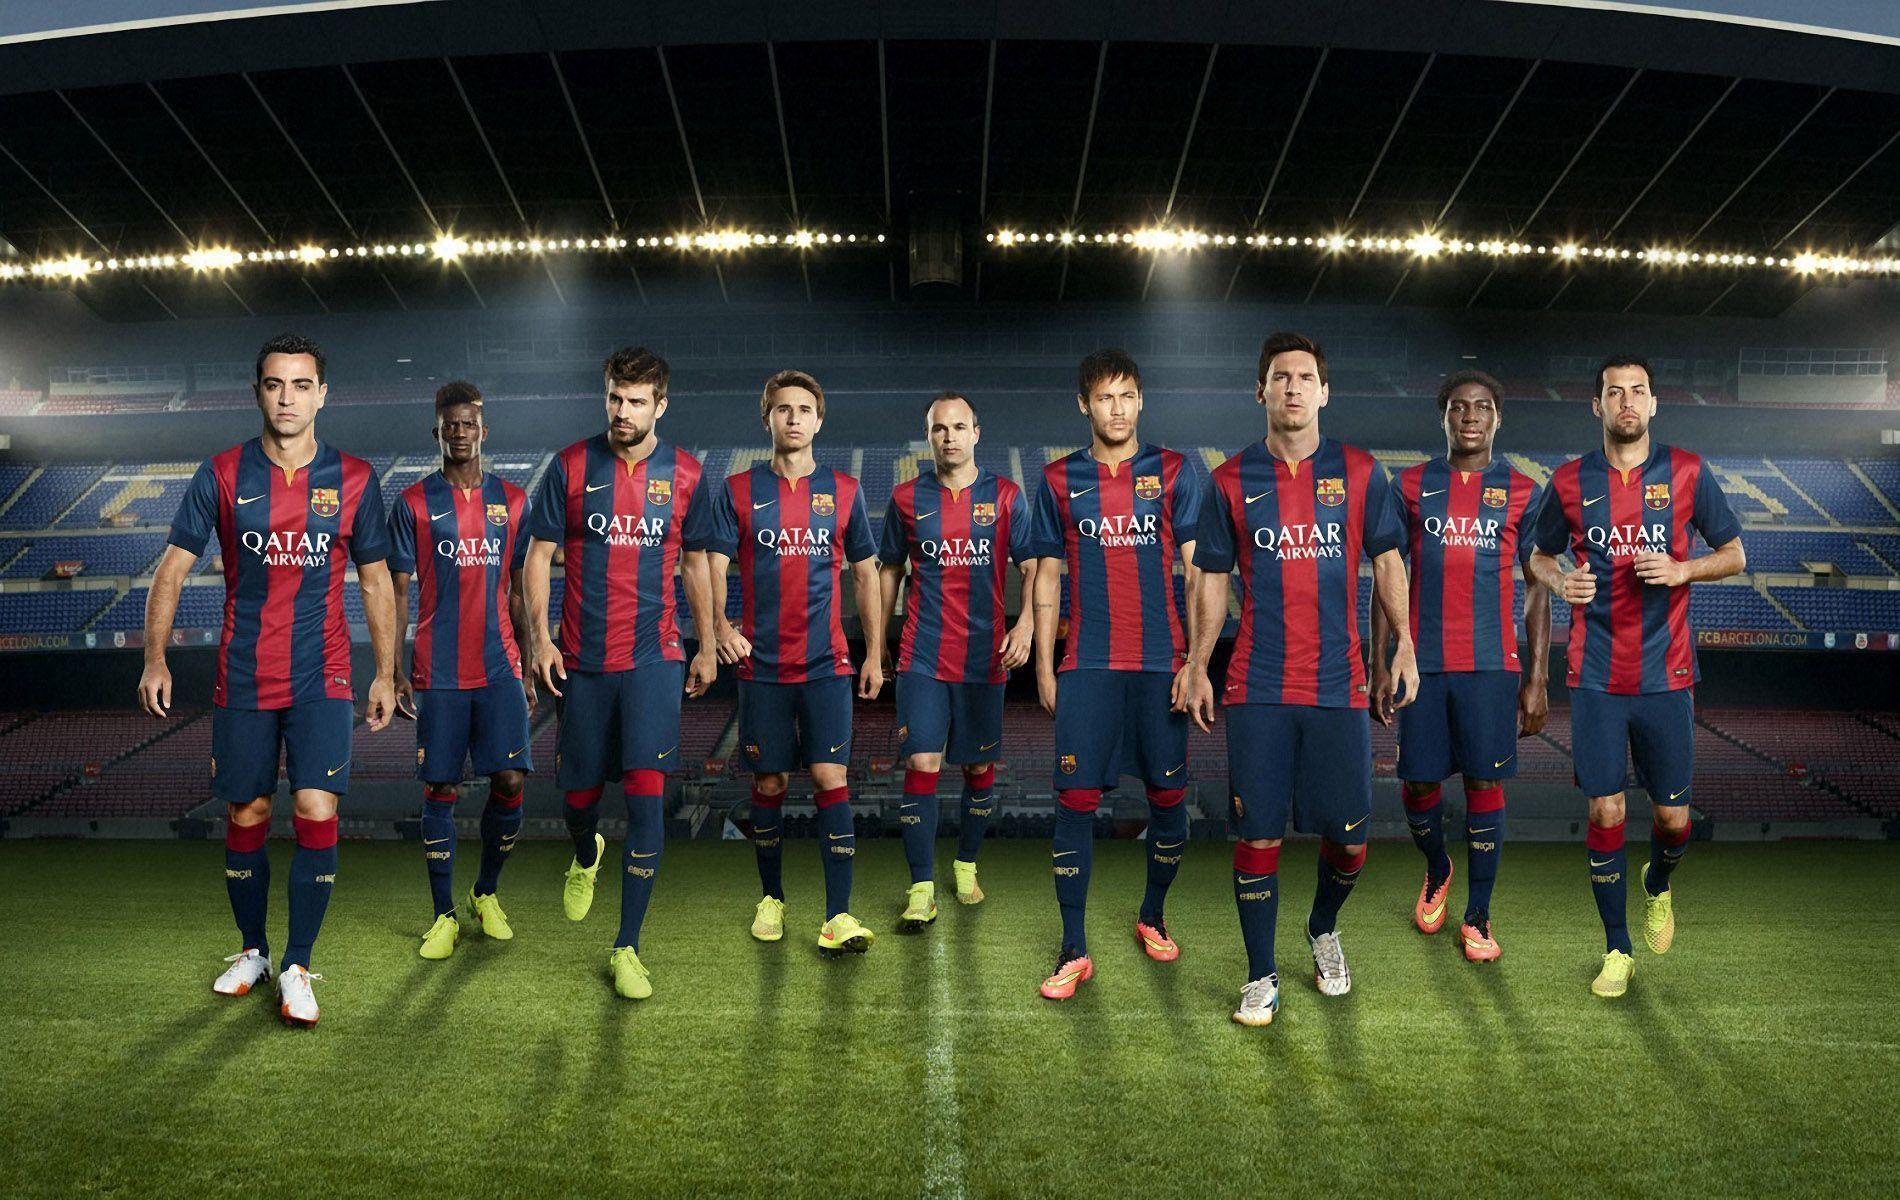 FC Barcelona 2014-2015 New Nike Home Kit Wallpaper Wide or HD ...